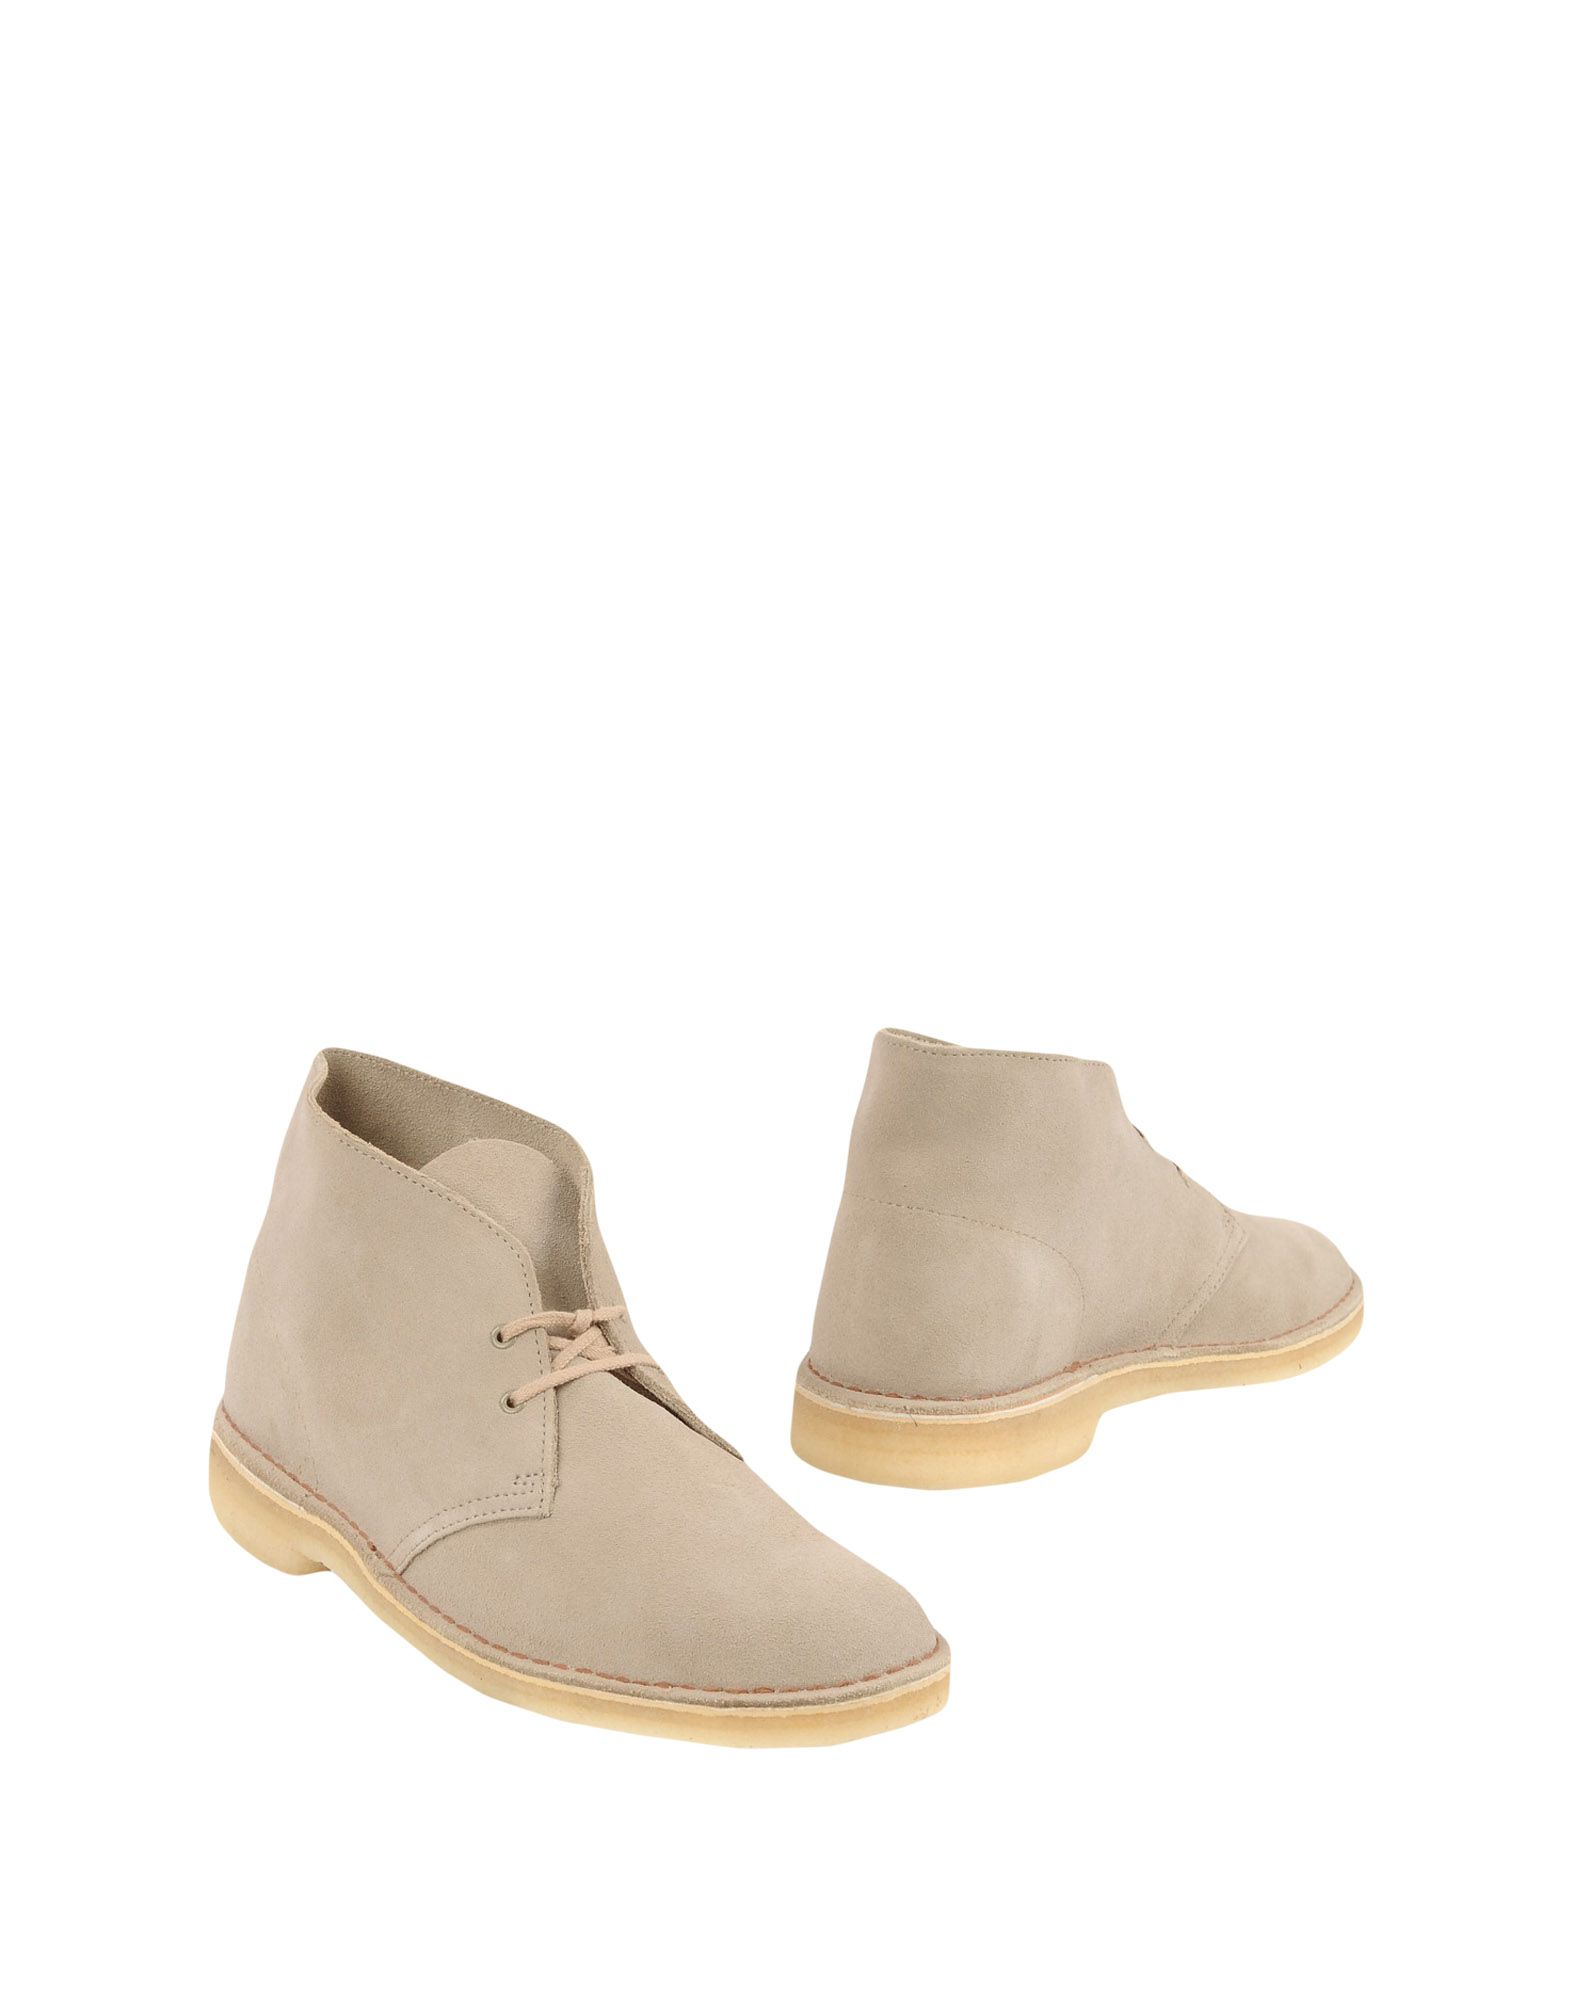 Stivaletti Clarks Originals Desert Boot - Uomo - Acquista online su